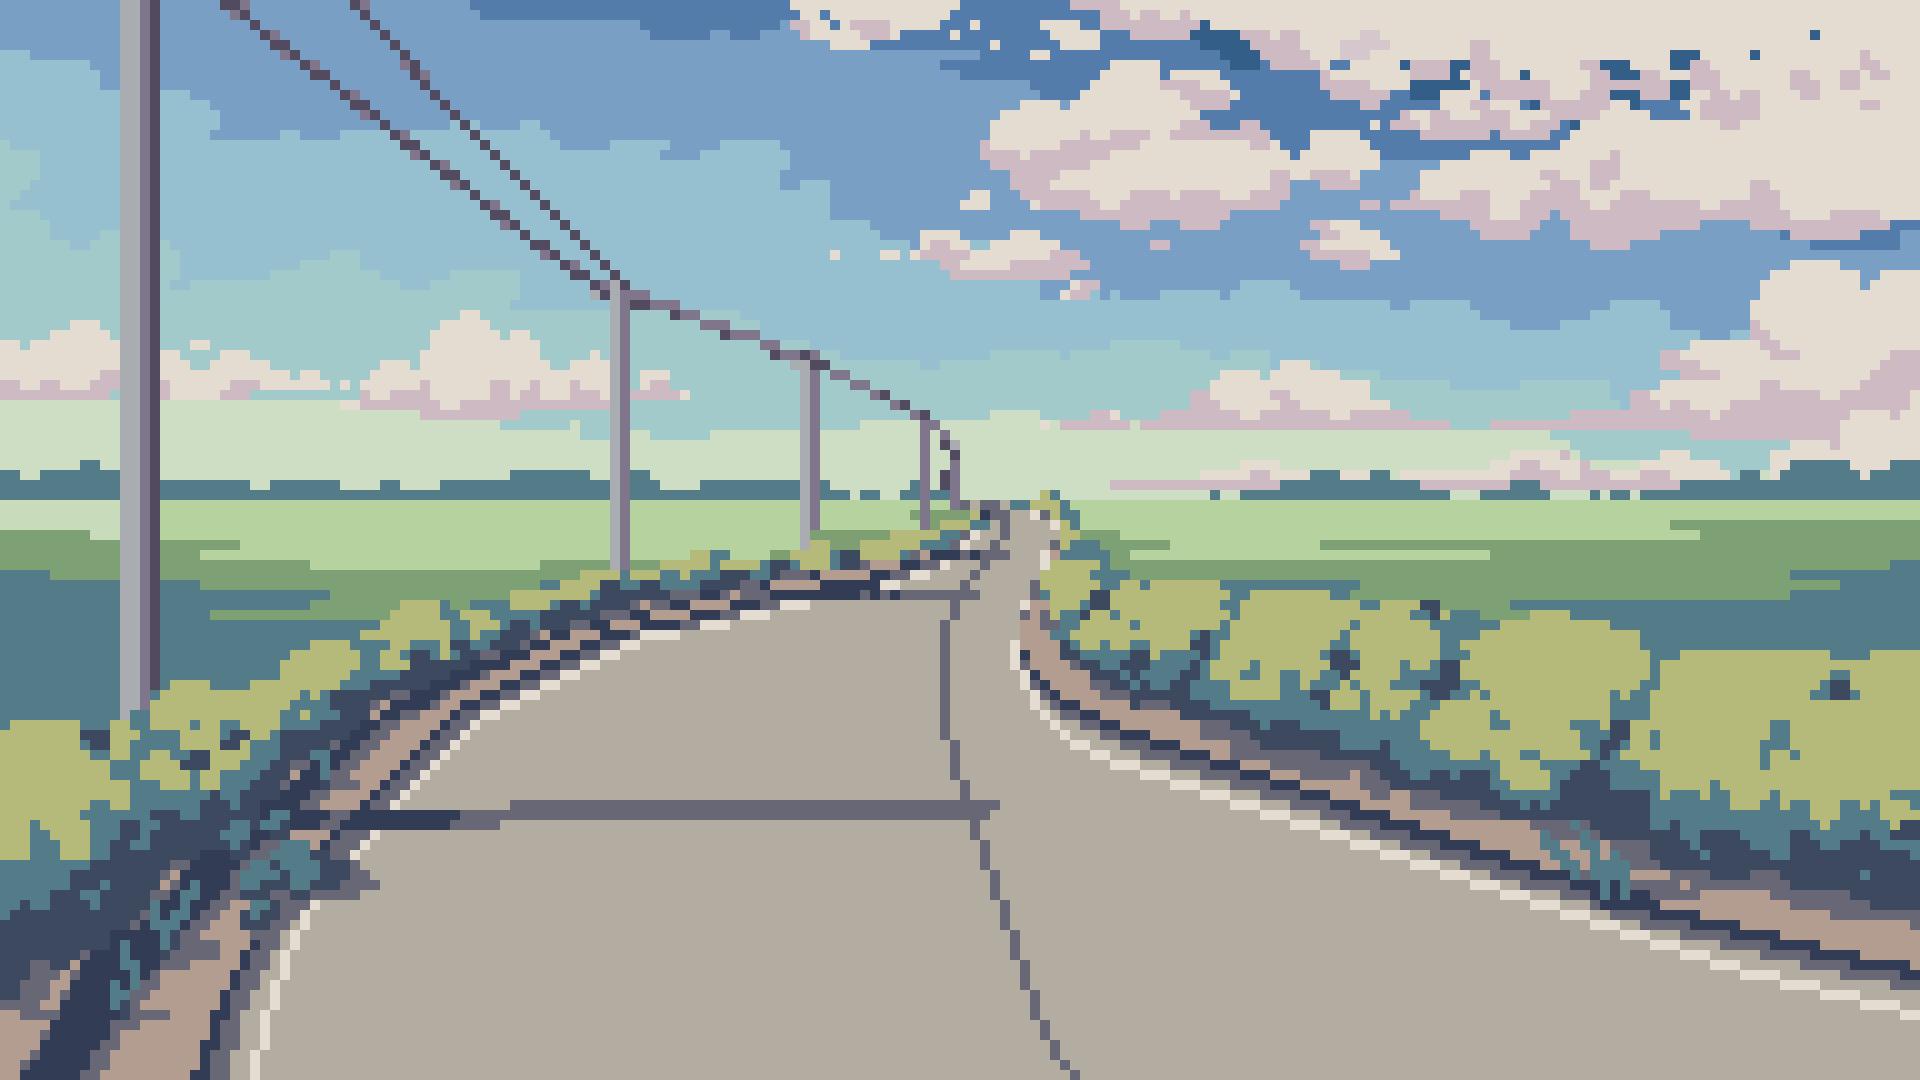 pixel art 1920x1080